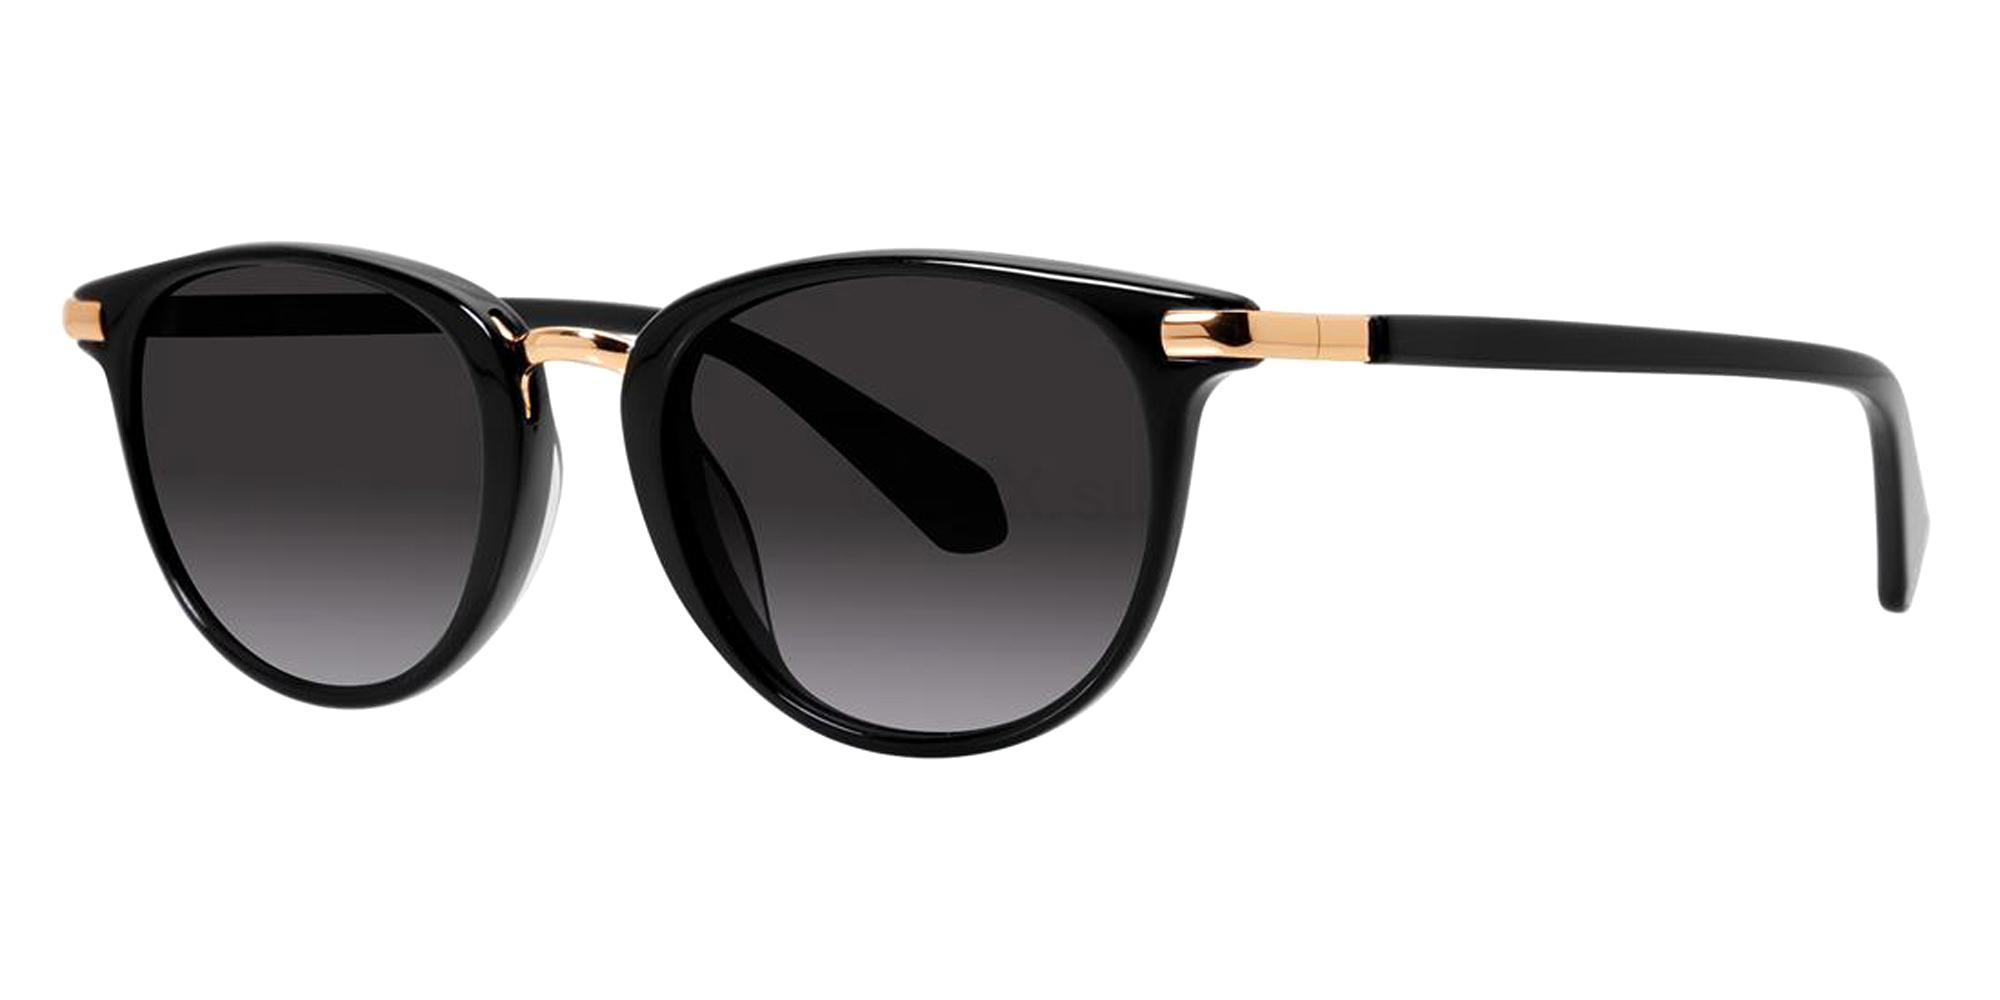 Black DAYLE SUN Sunglasses, Zac Posen